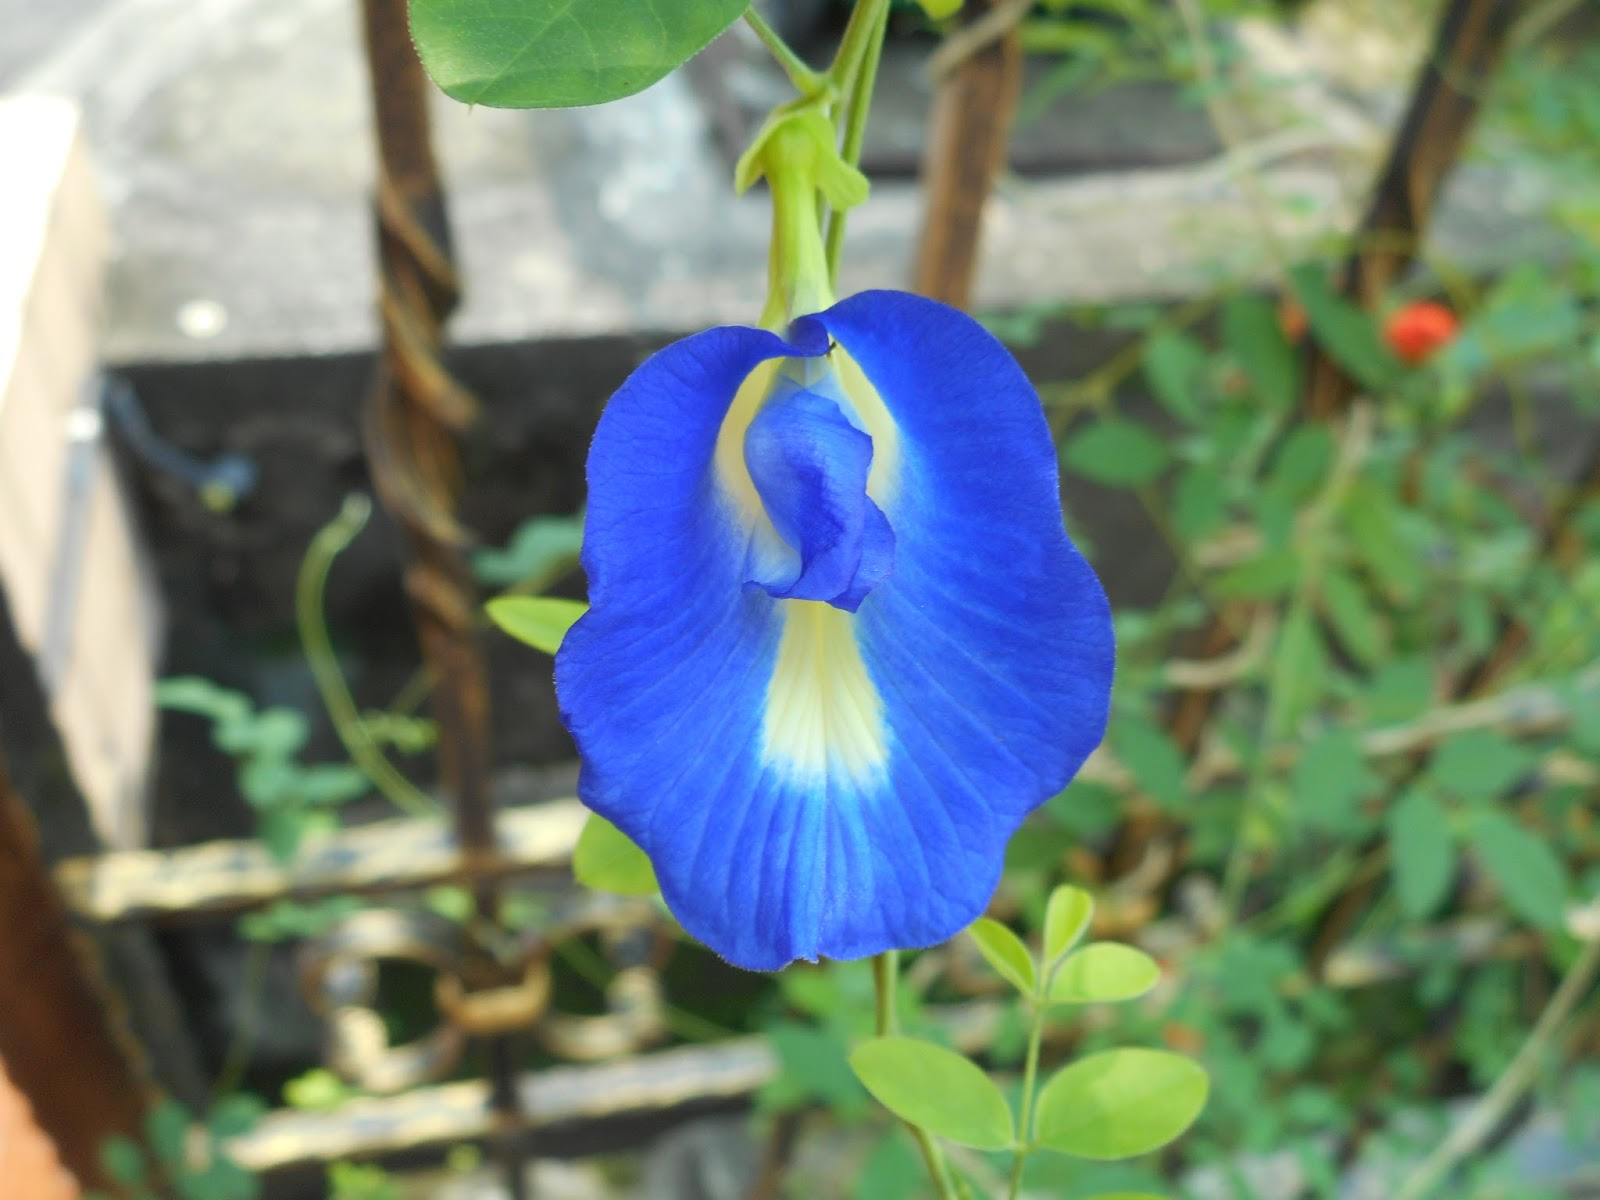 Refreshing blue pea flower tea with lemon the hedgehog knows refreshing blue pea flower tea with lemon izmirmasajfo